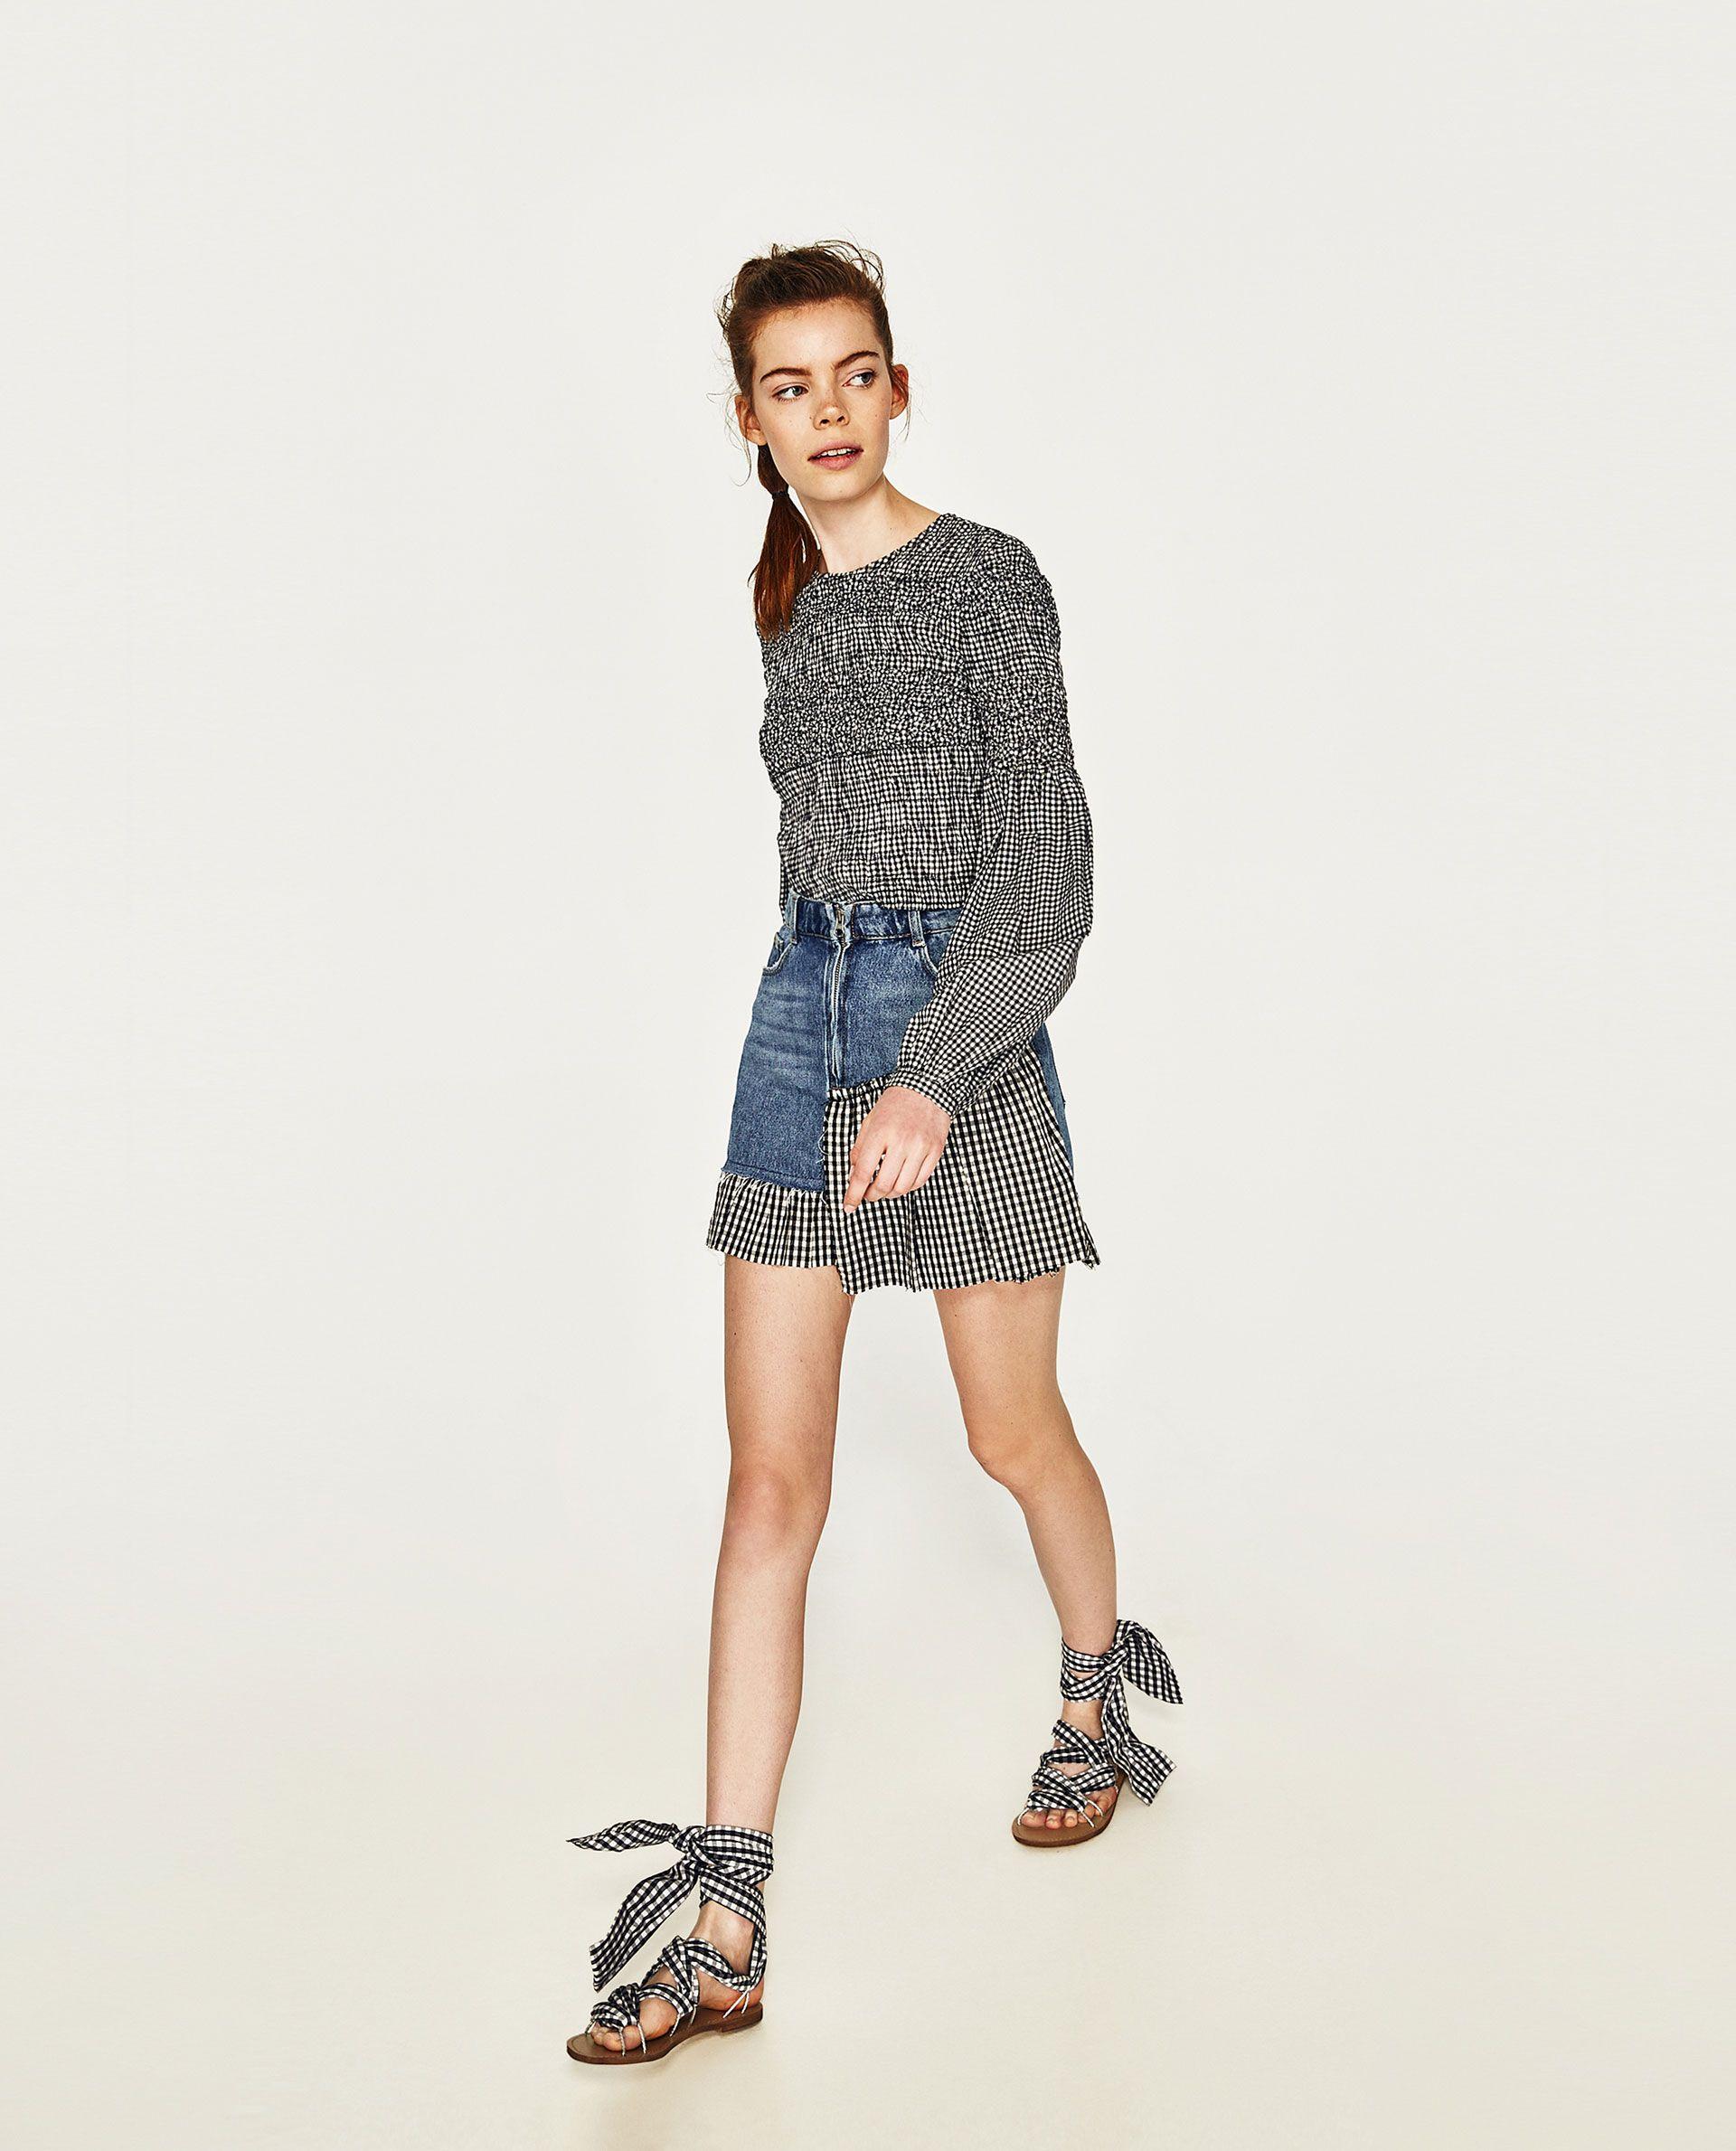 ffef68933 FALDA DENIM CUADROS | Zara Fashion 2017 | Jeans rock, Jeans und Zara ...